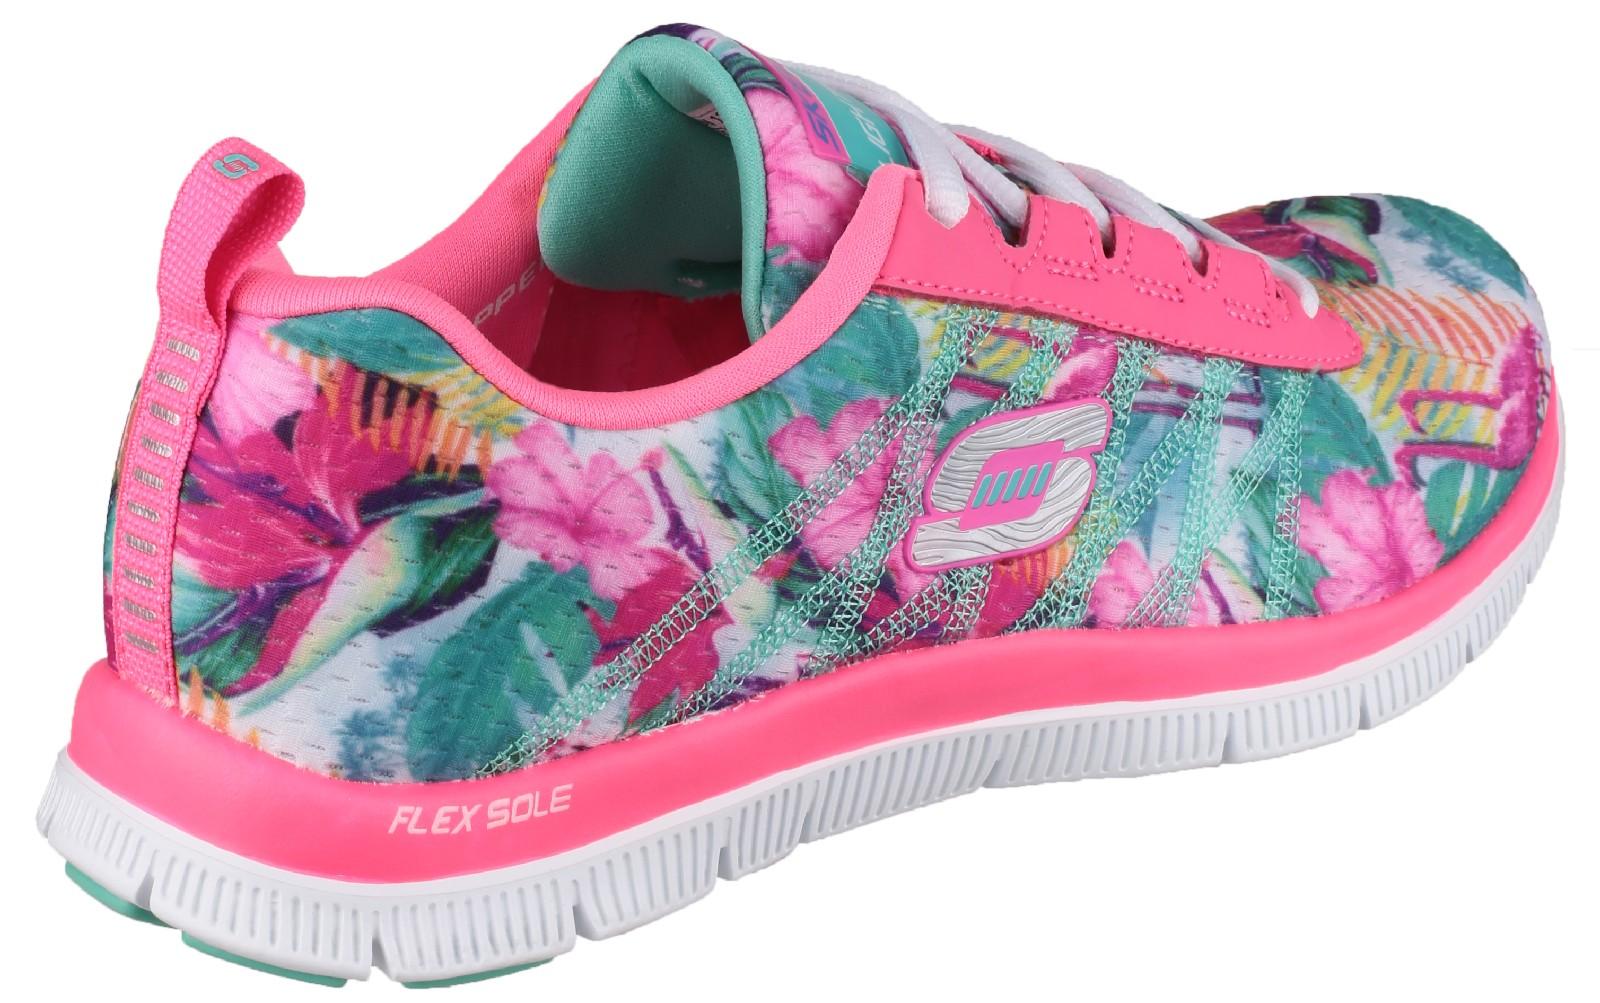 6b6b6729bc56 Skechers Flex Appeal Floral Bloom Sports Shoes